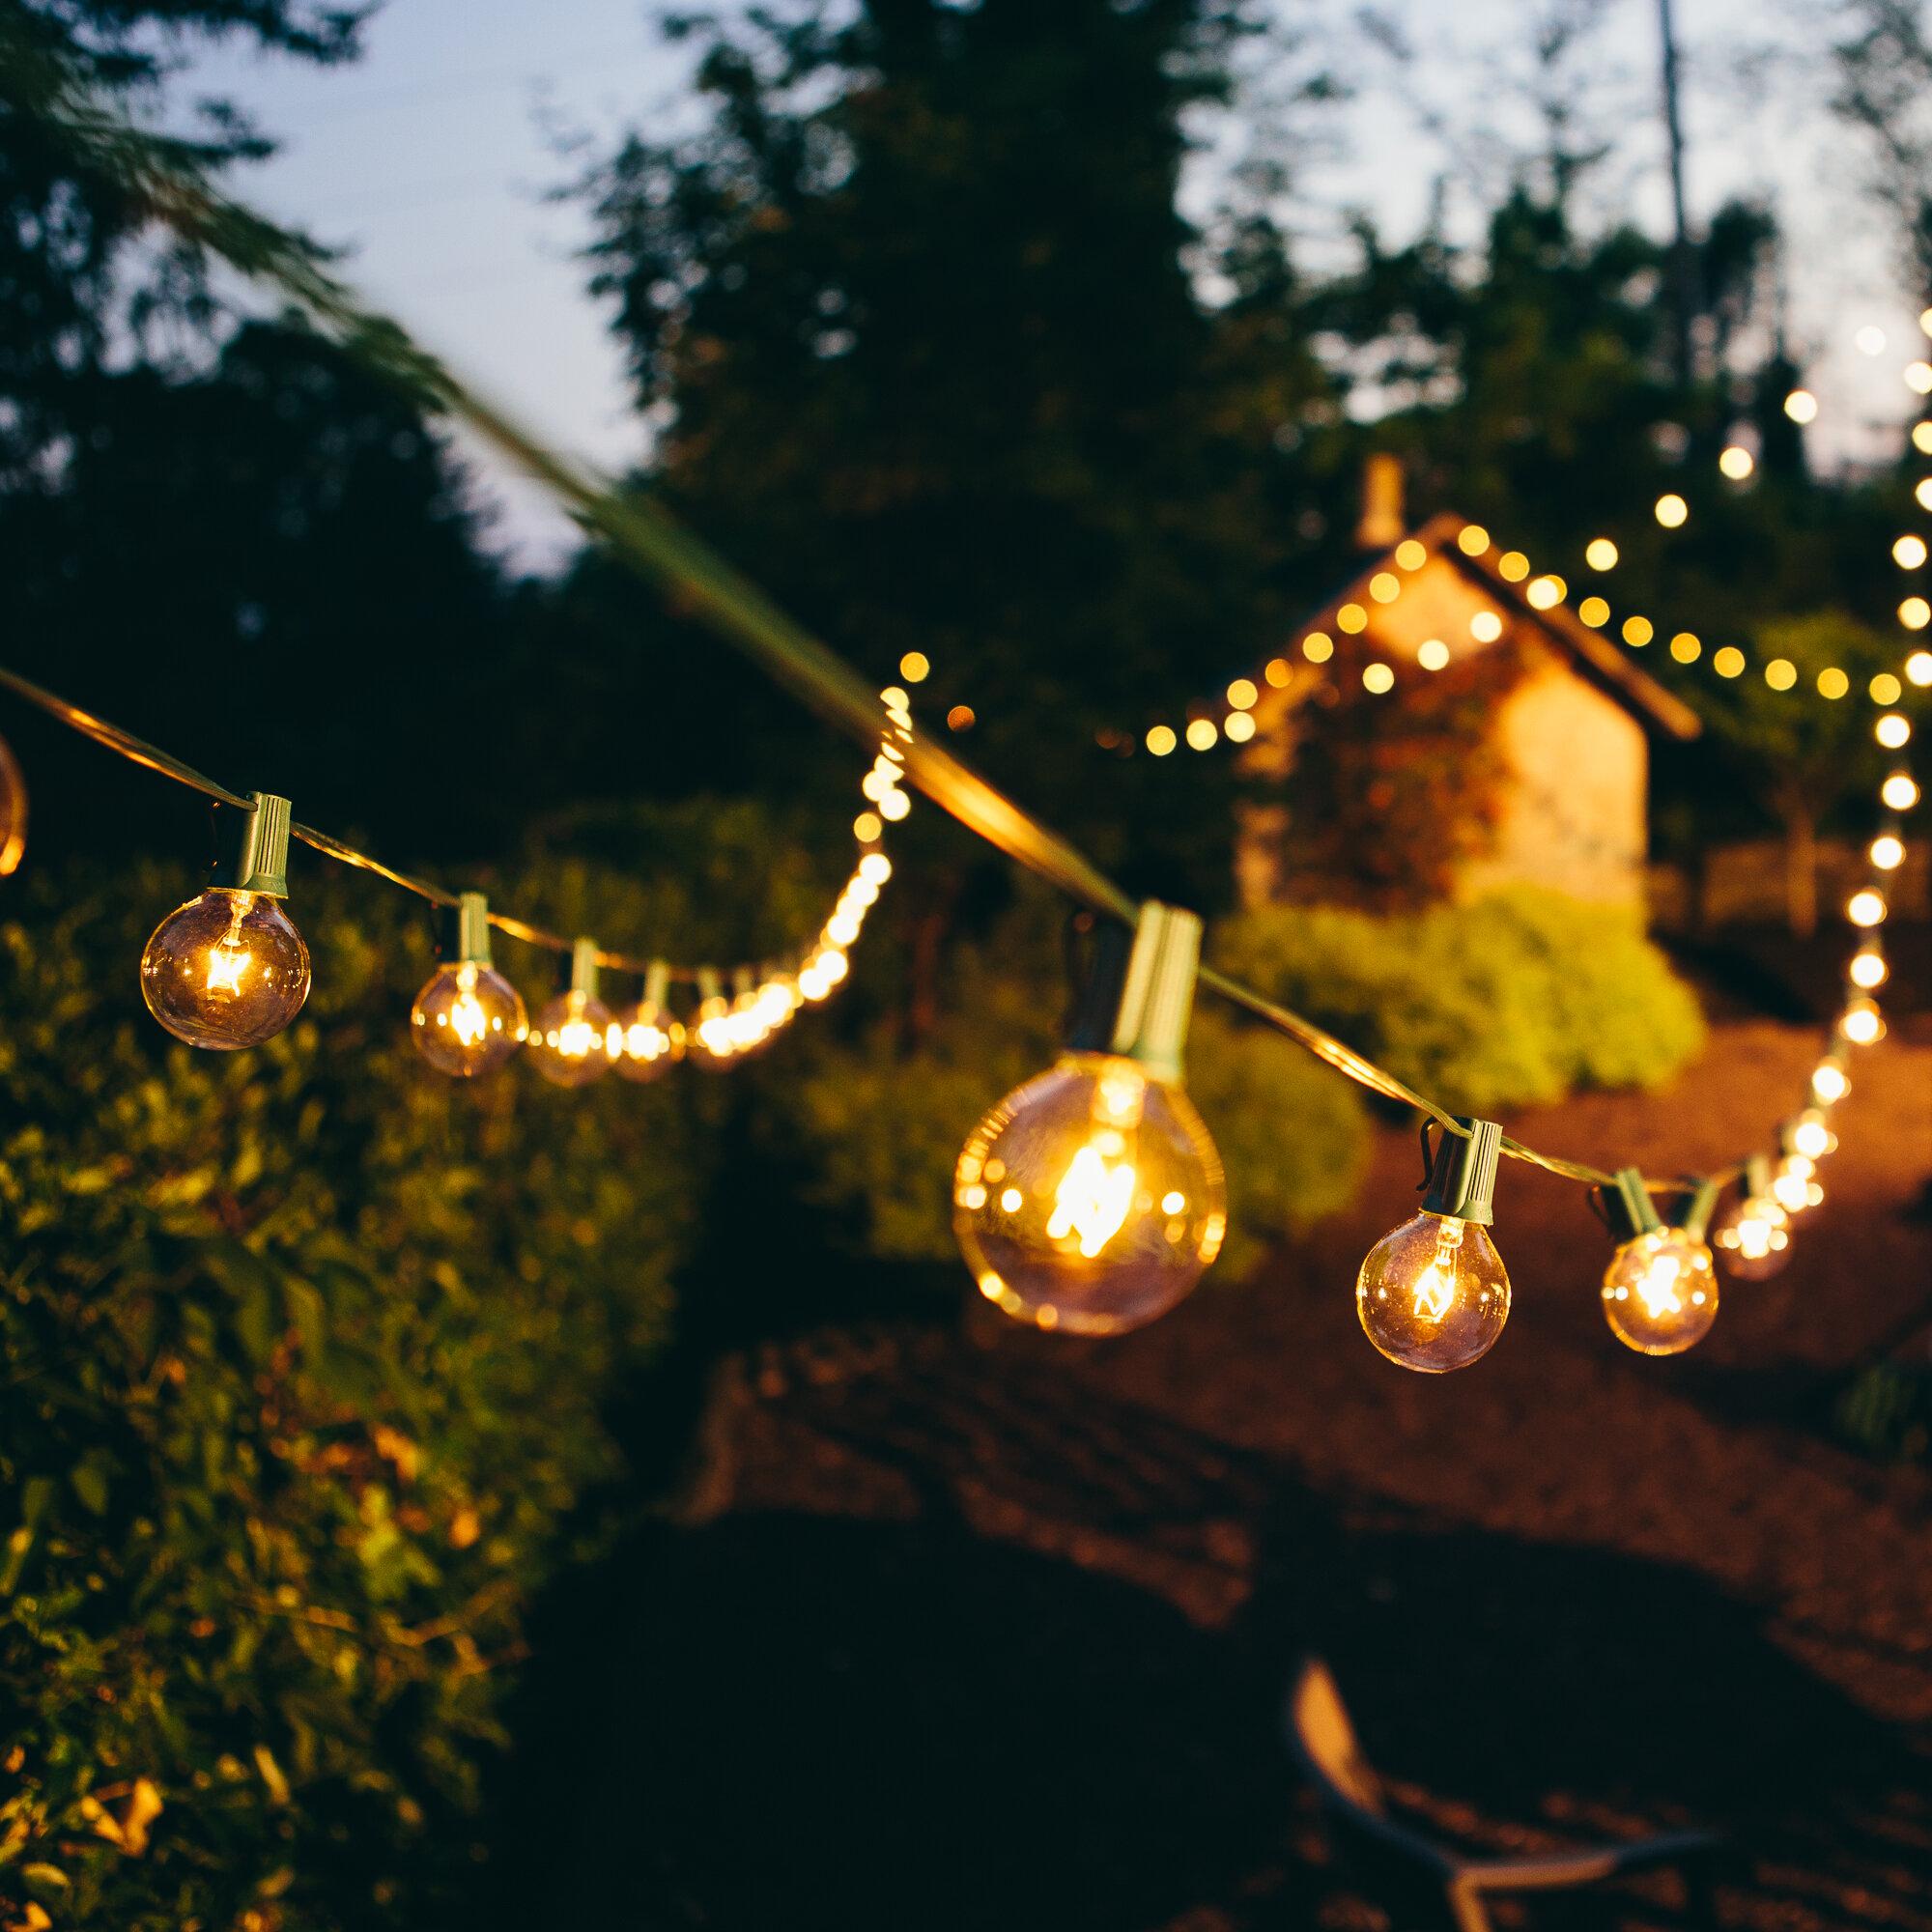 Big Sale String Lights Under 100 You Ll Love In 2020